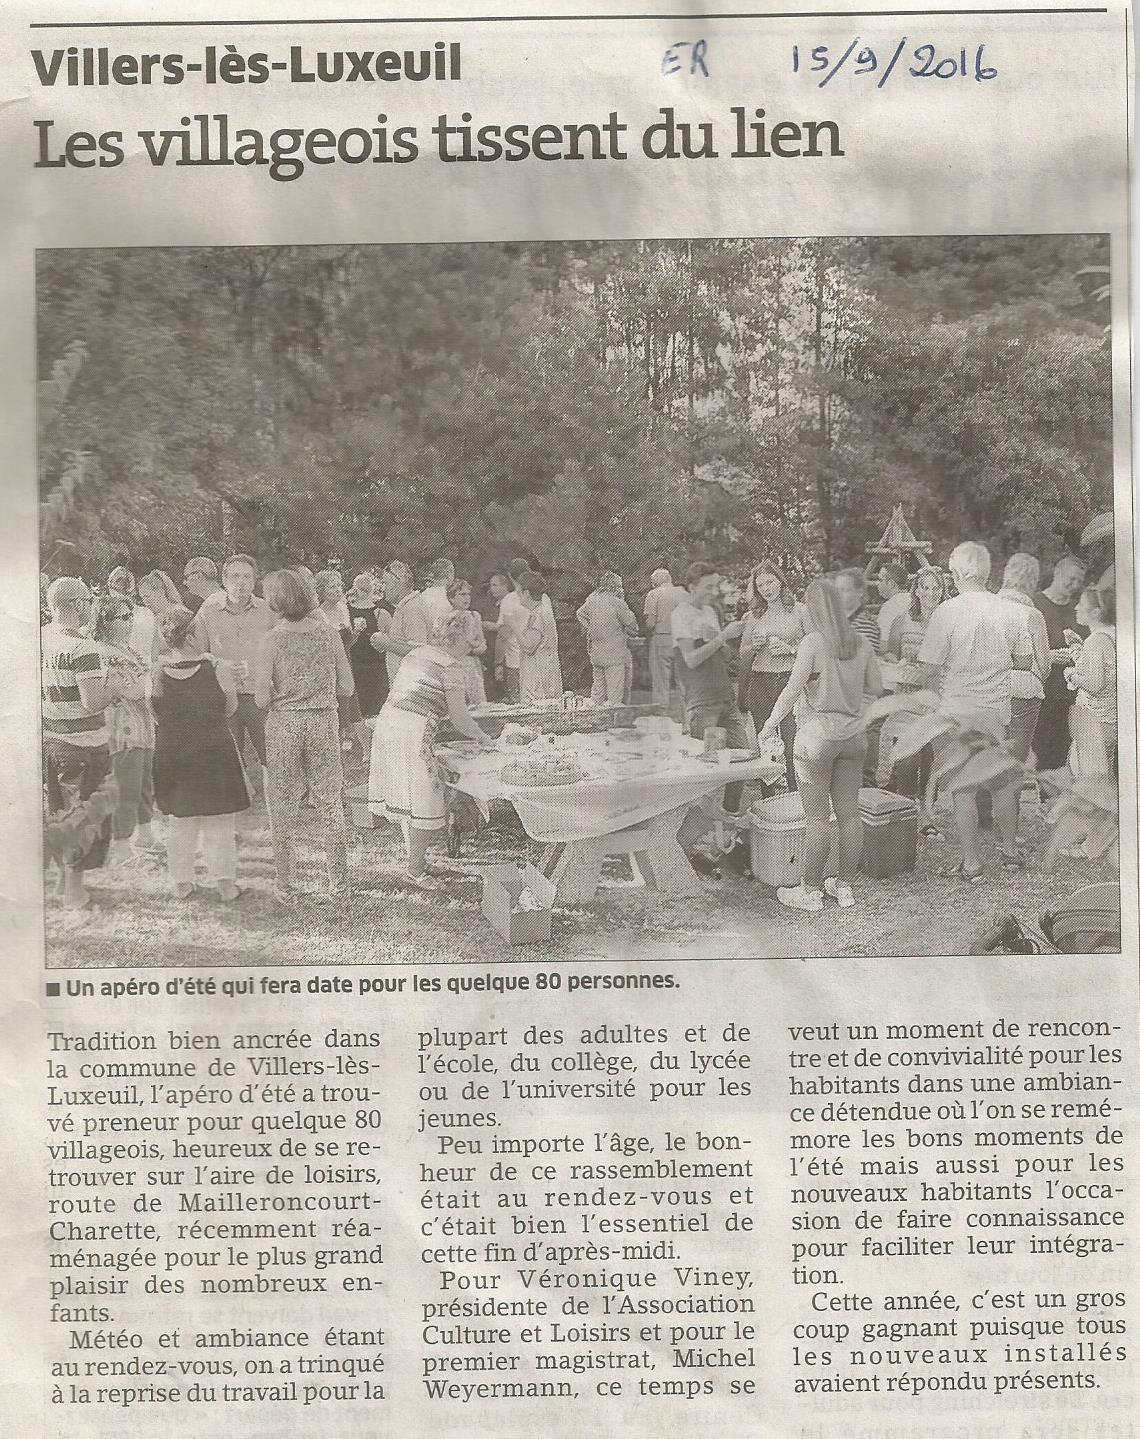 https://www.villers-les-luxeuil.com/projets/villers/files/images/2016_Mairie/Presse/2016_09_15_Aperitif.jpg